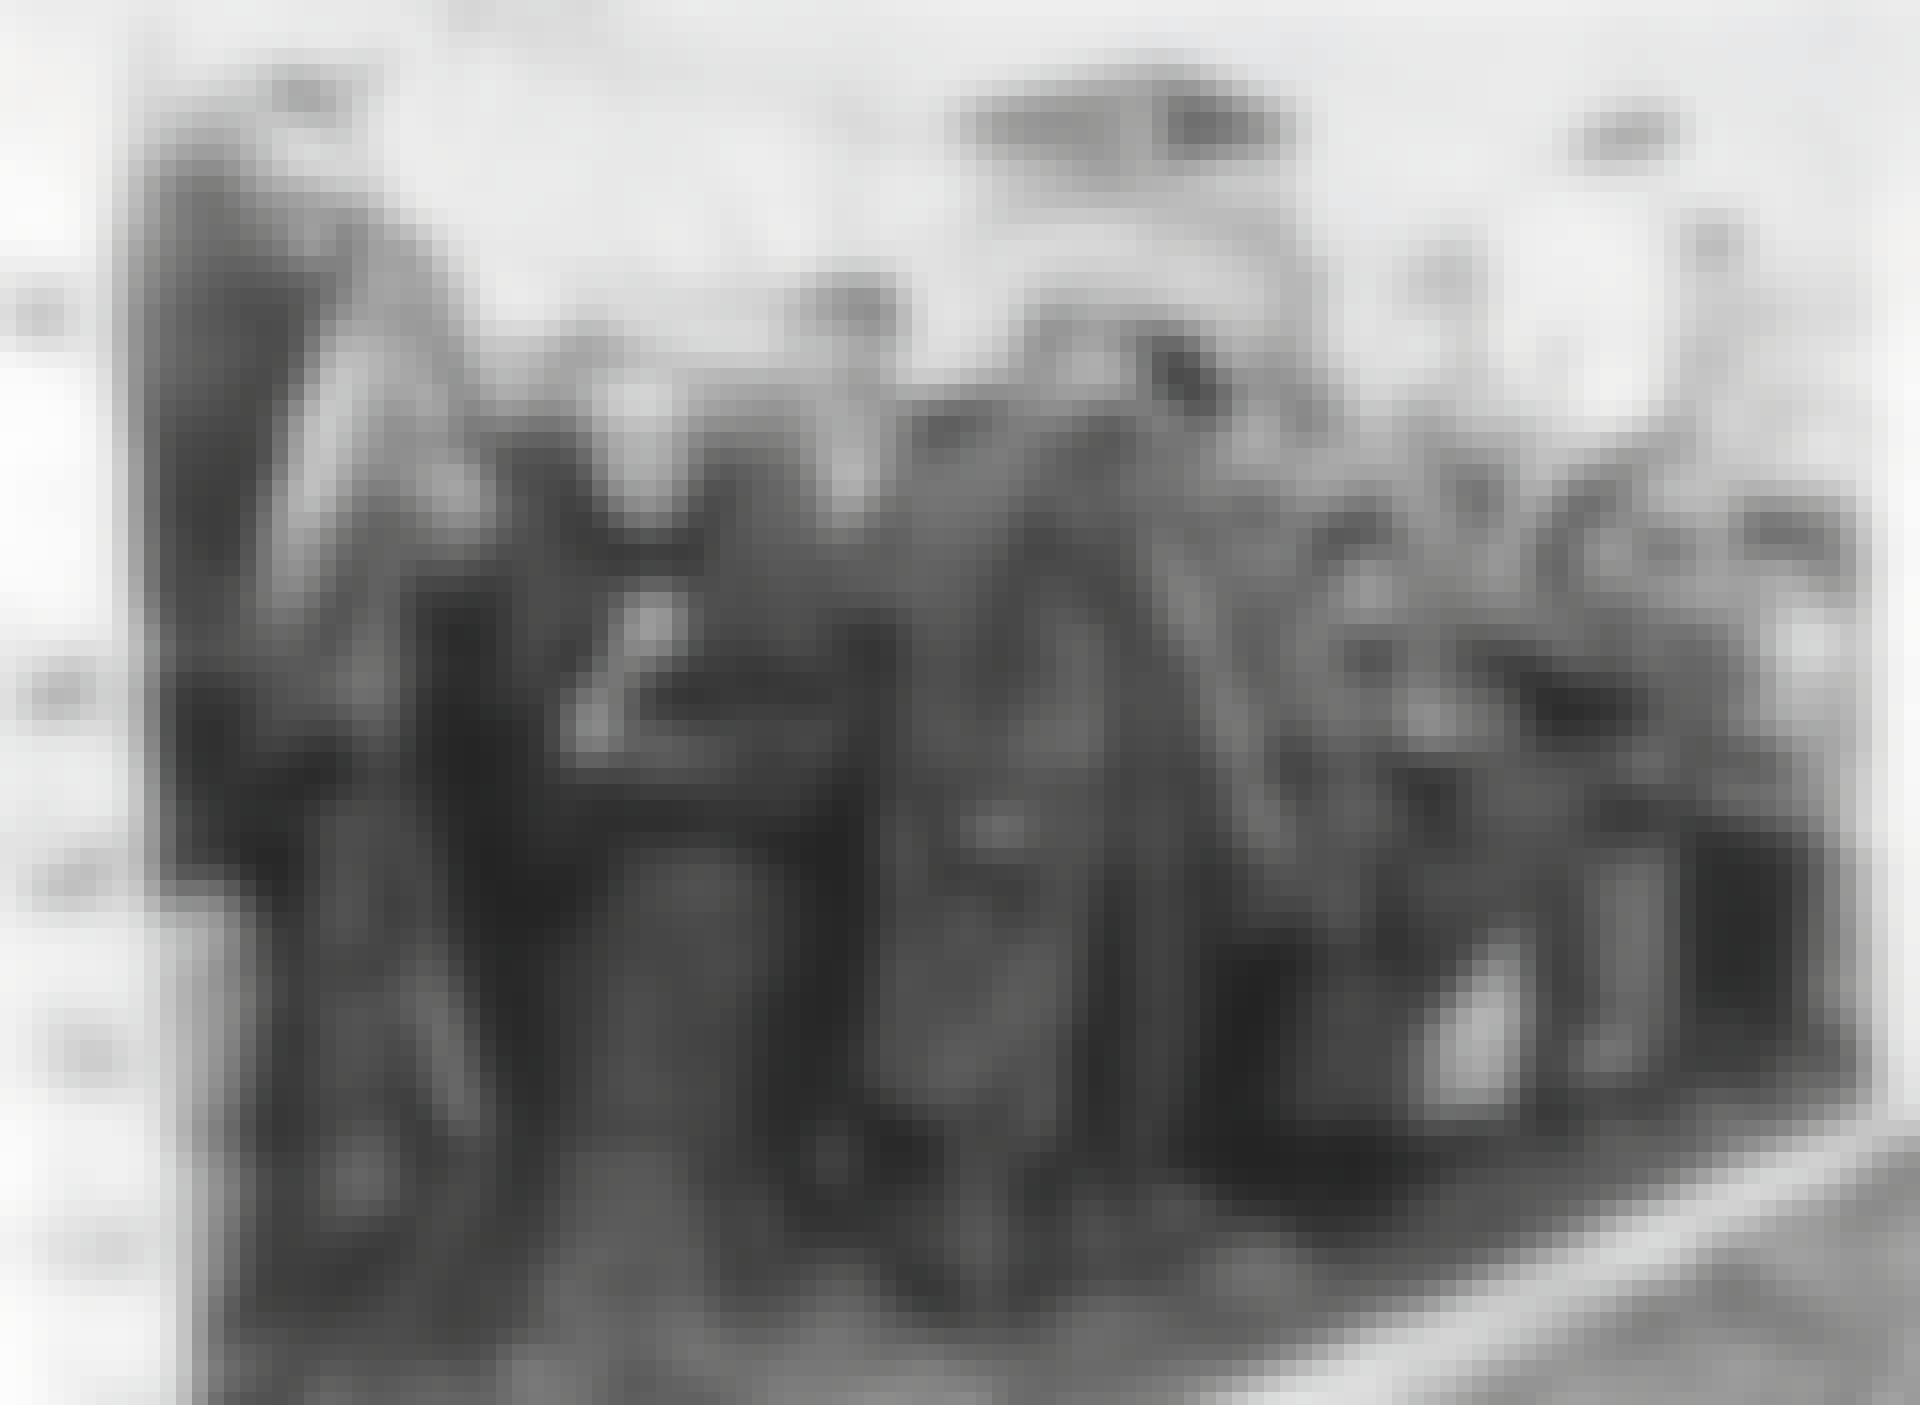 Puna-armeija löysi Auschwitzin vangit